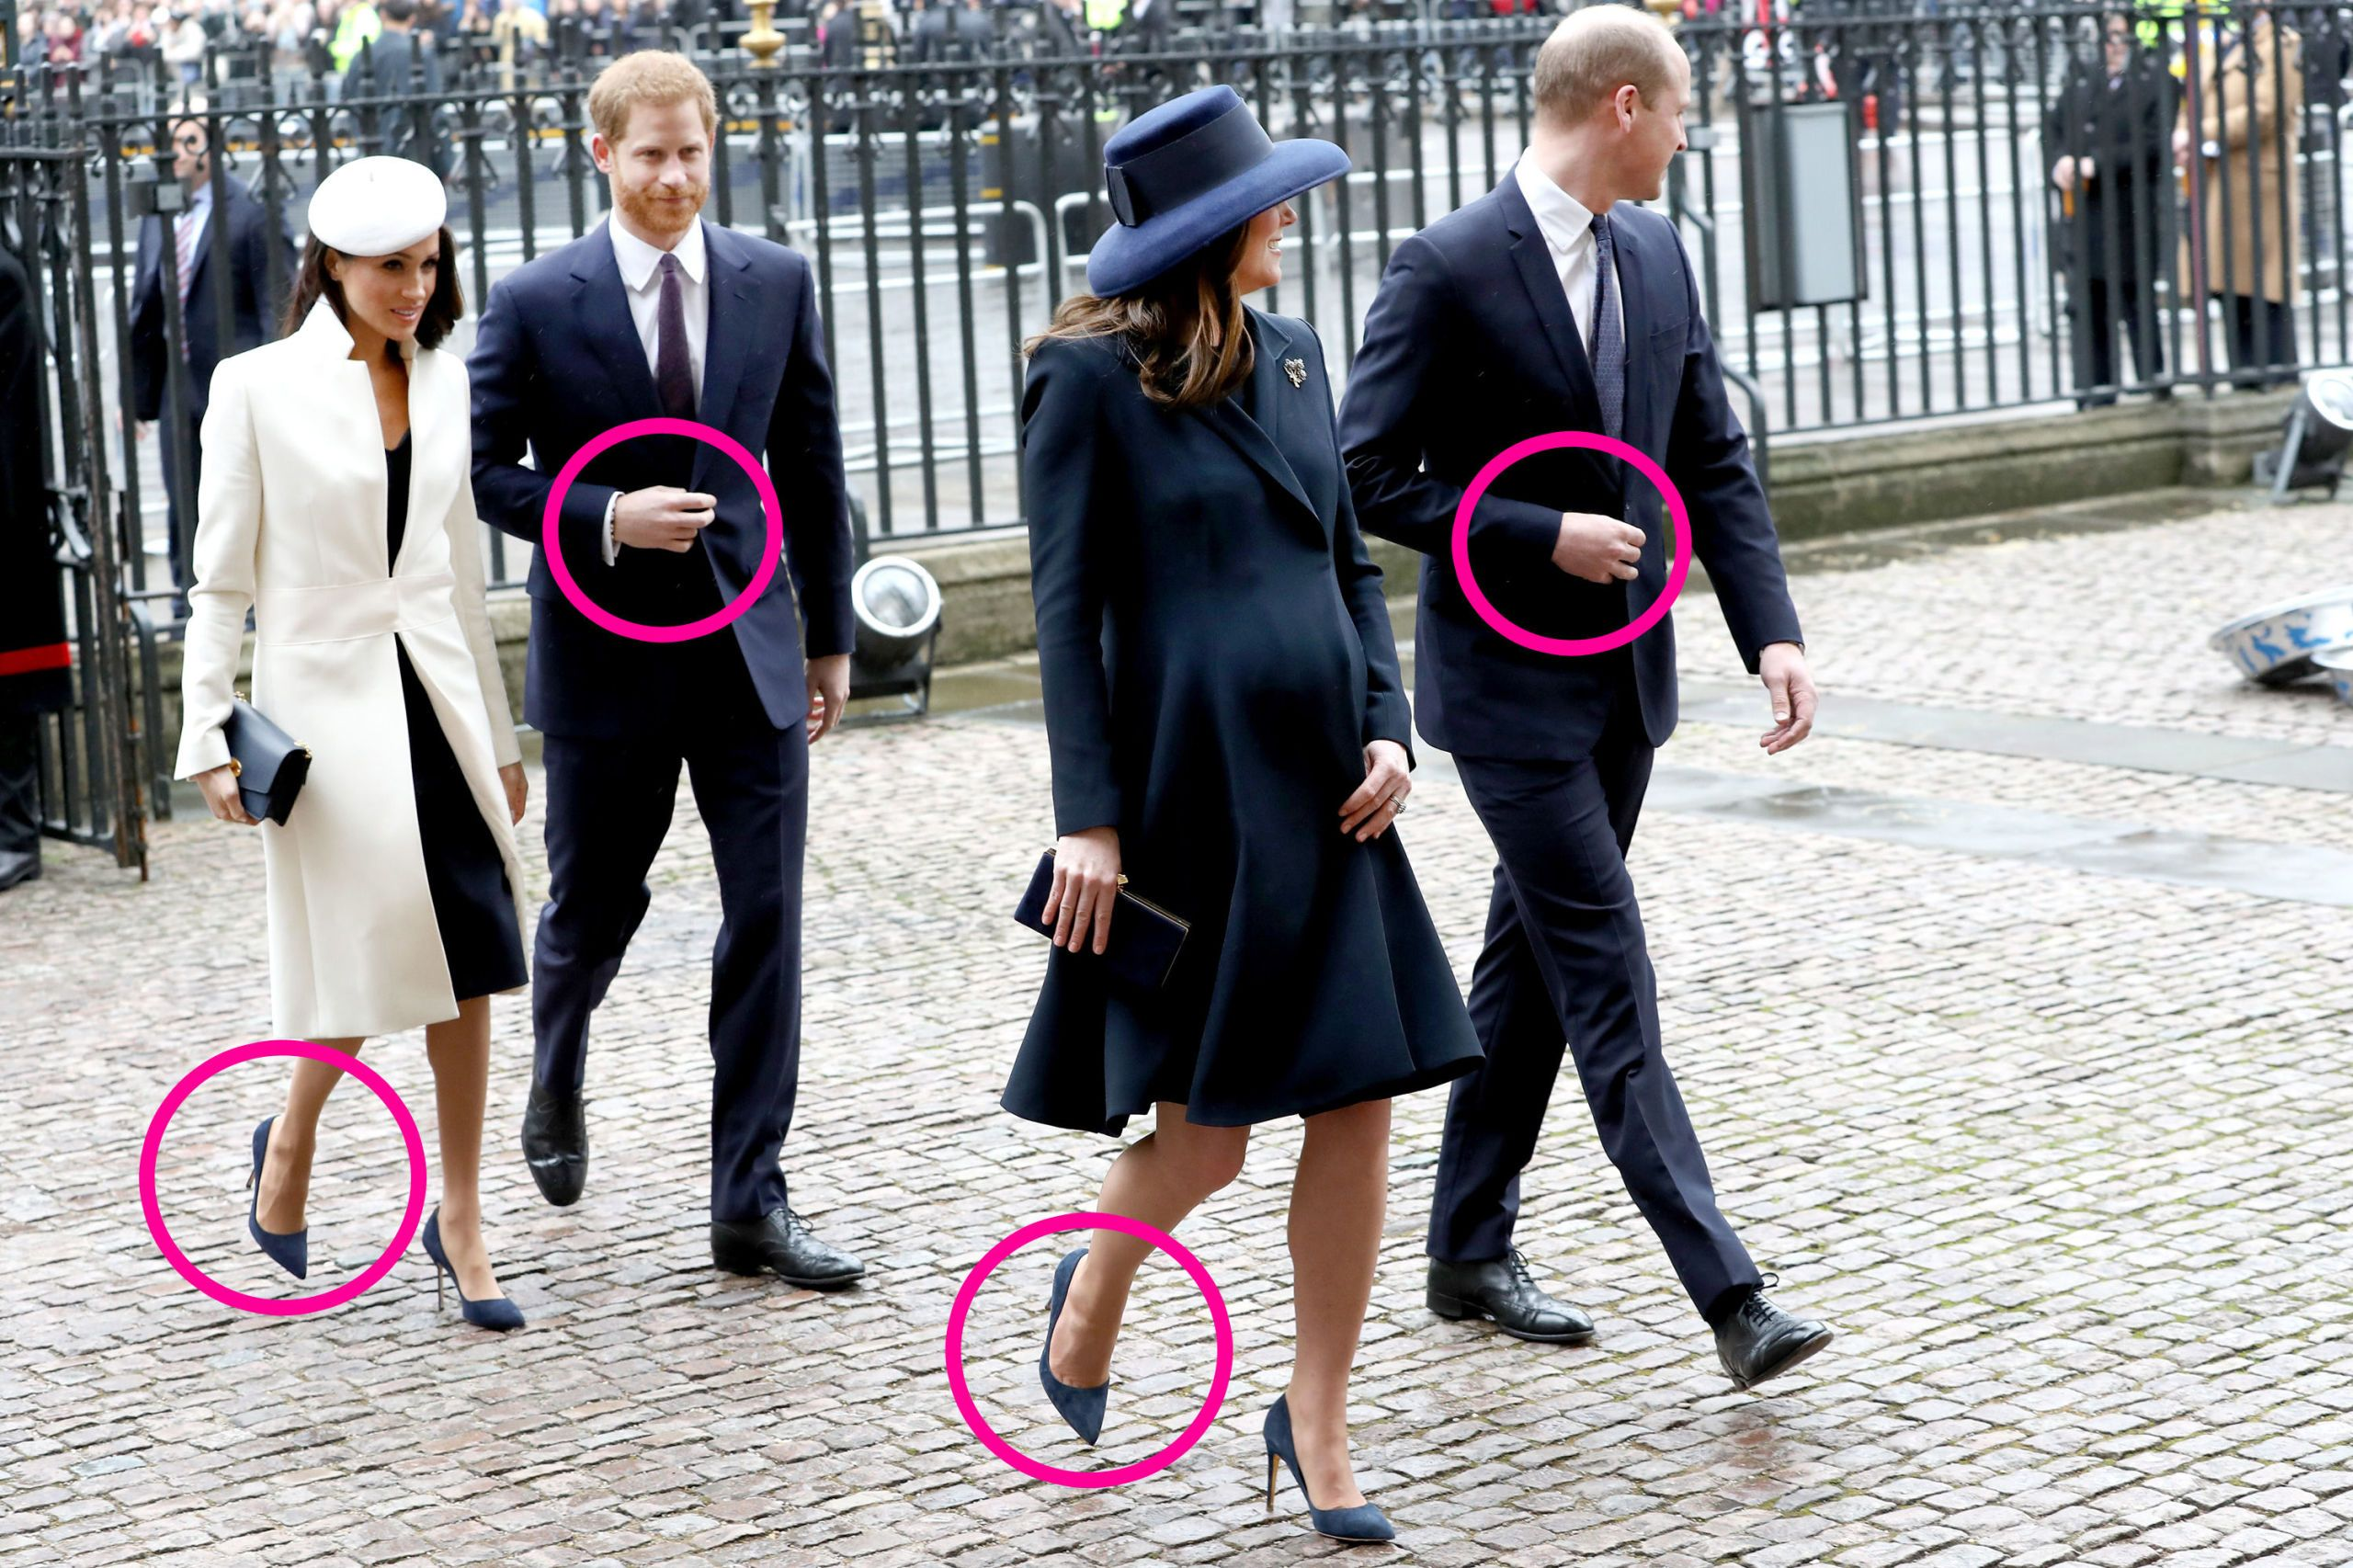 Body Language Experts Analyze Meghan Markle and Kate Middletons Friendship Body Language Experts Analyze Meghan Markle and Kate Middletons Friendship new foto